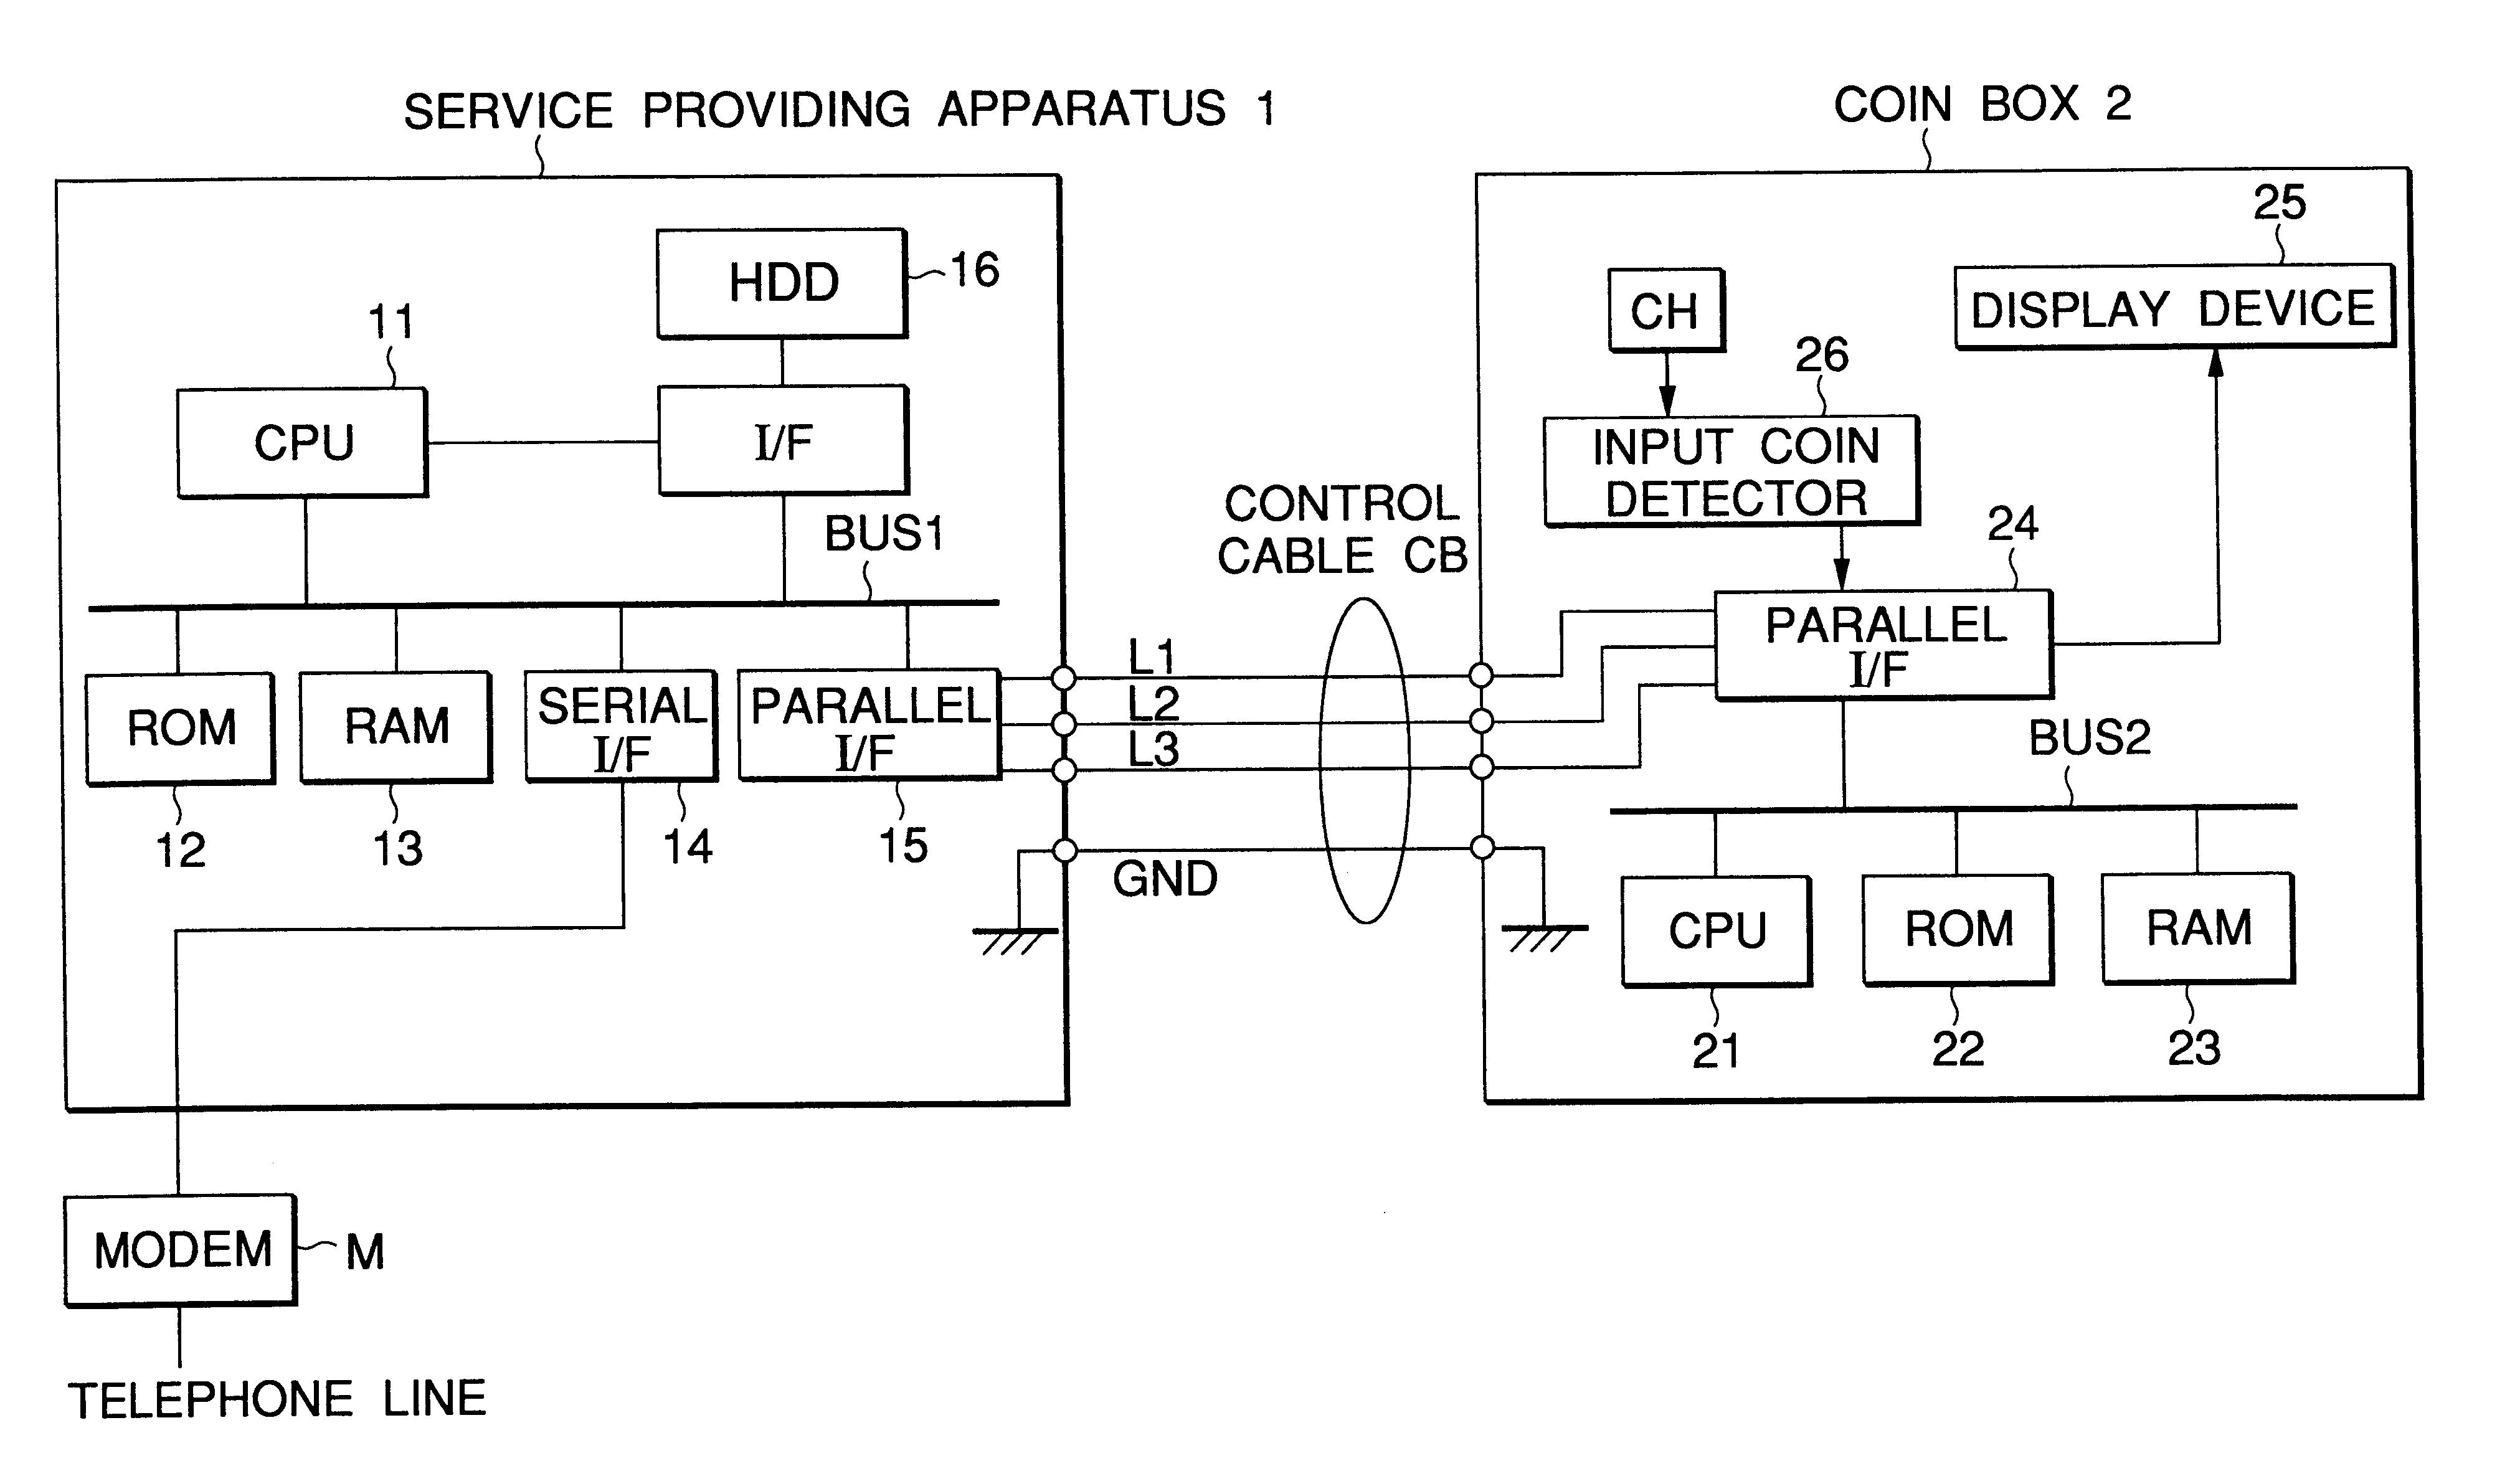 karaoke system wiring diagram megavision karaoke remote ... on